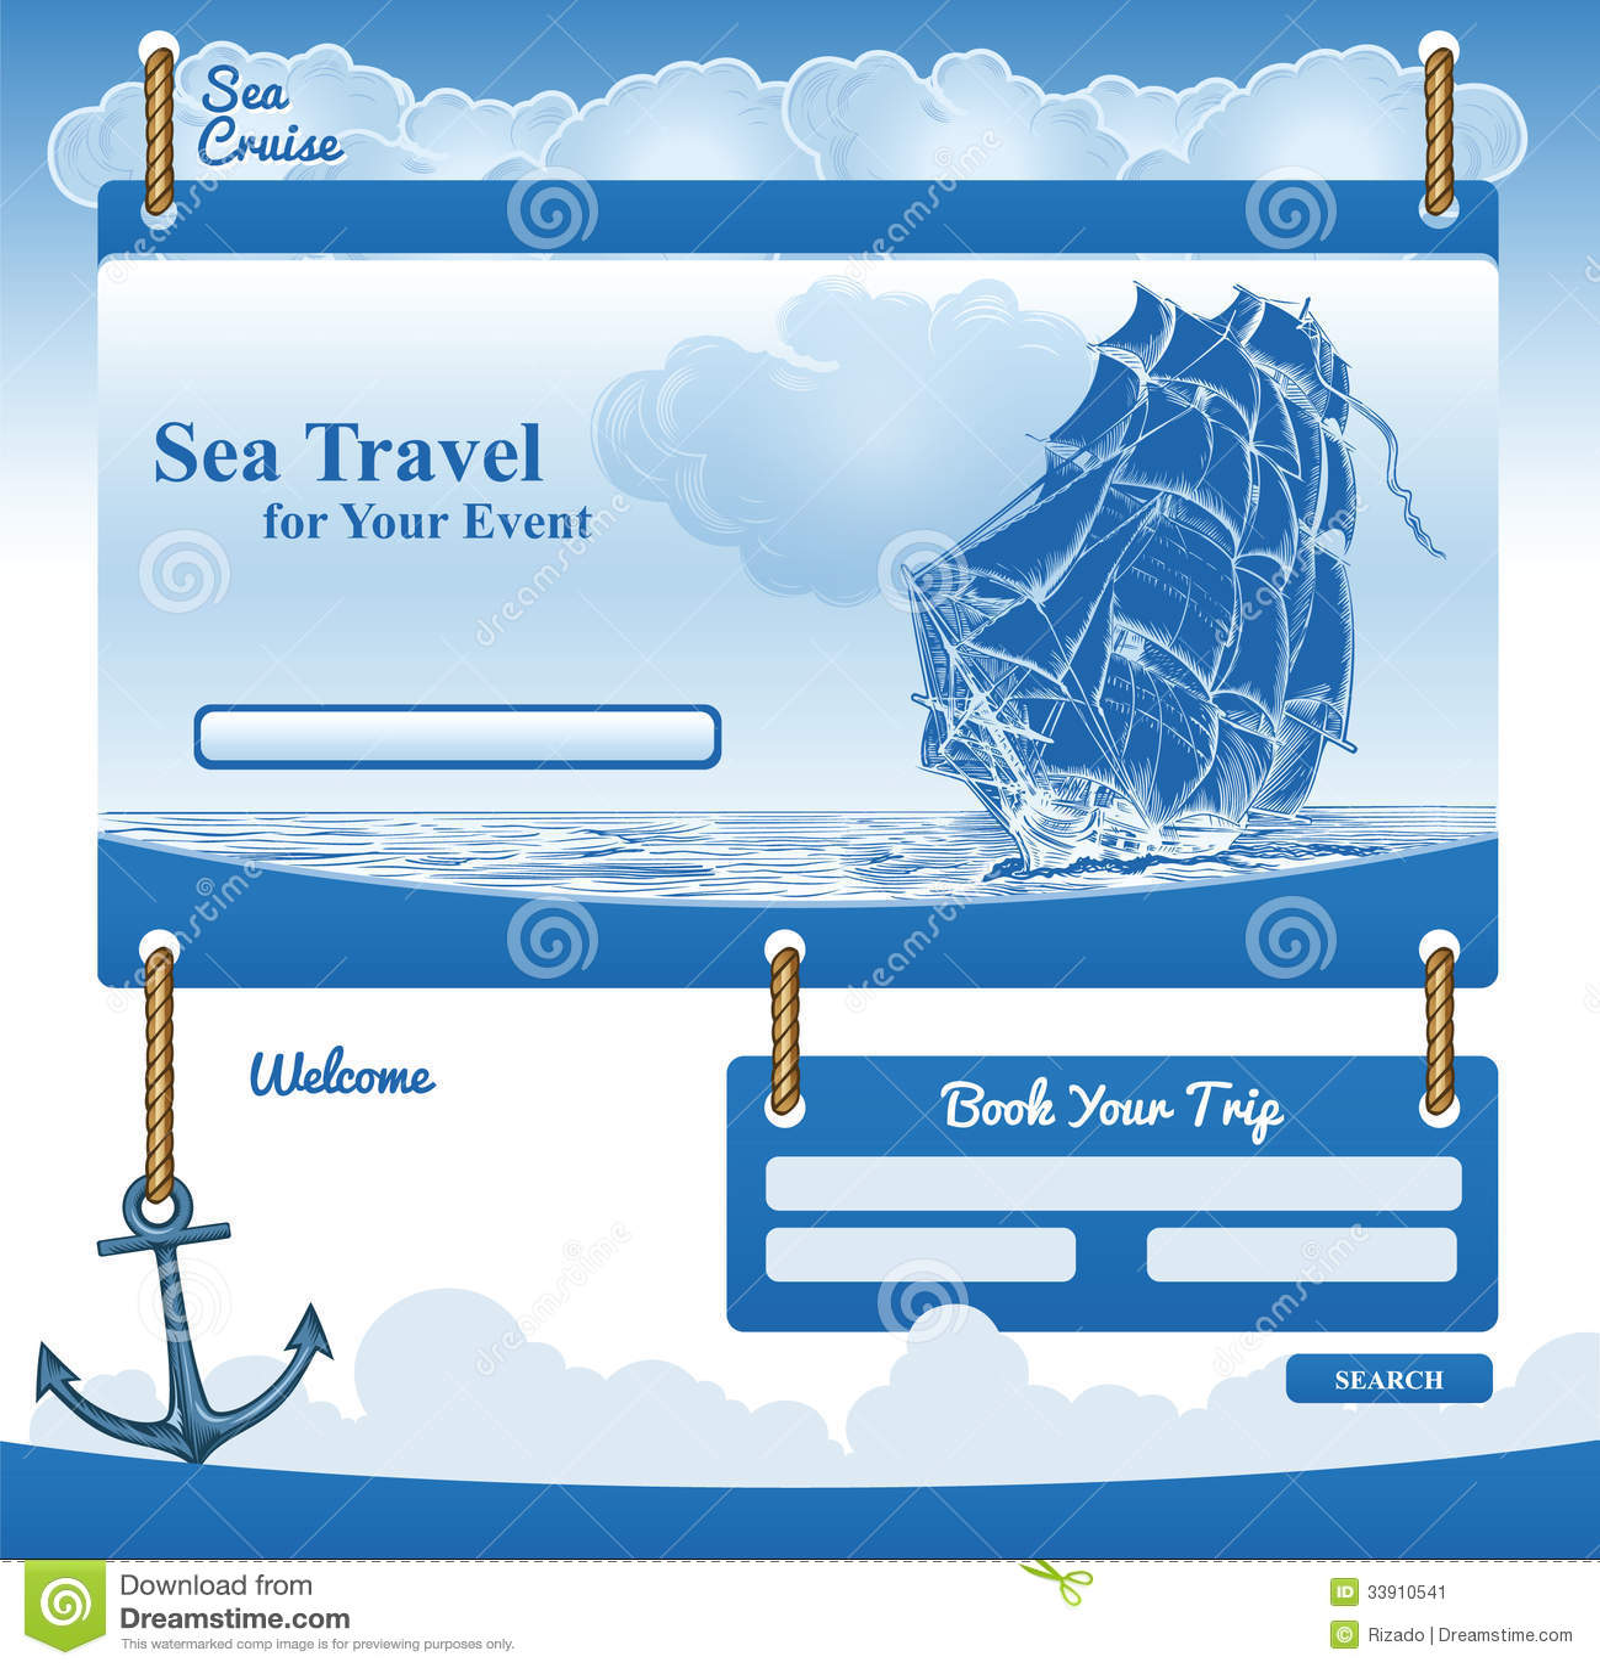 Under The Sea Invitation Template for awesome invitations ideas